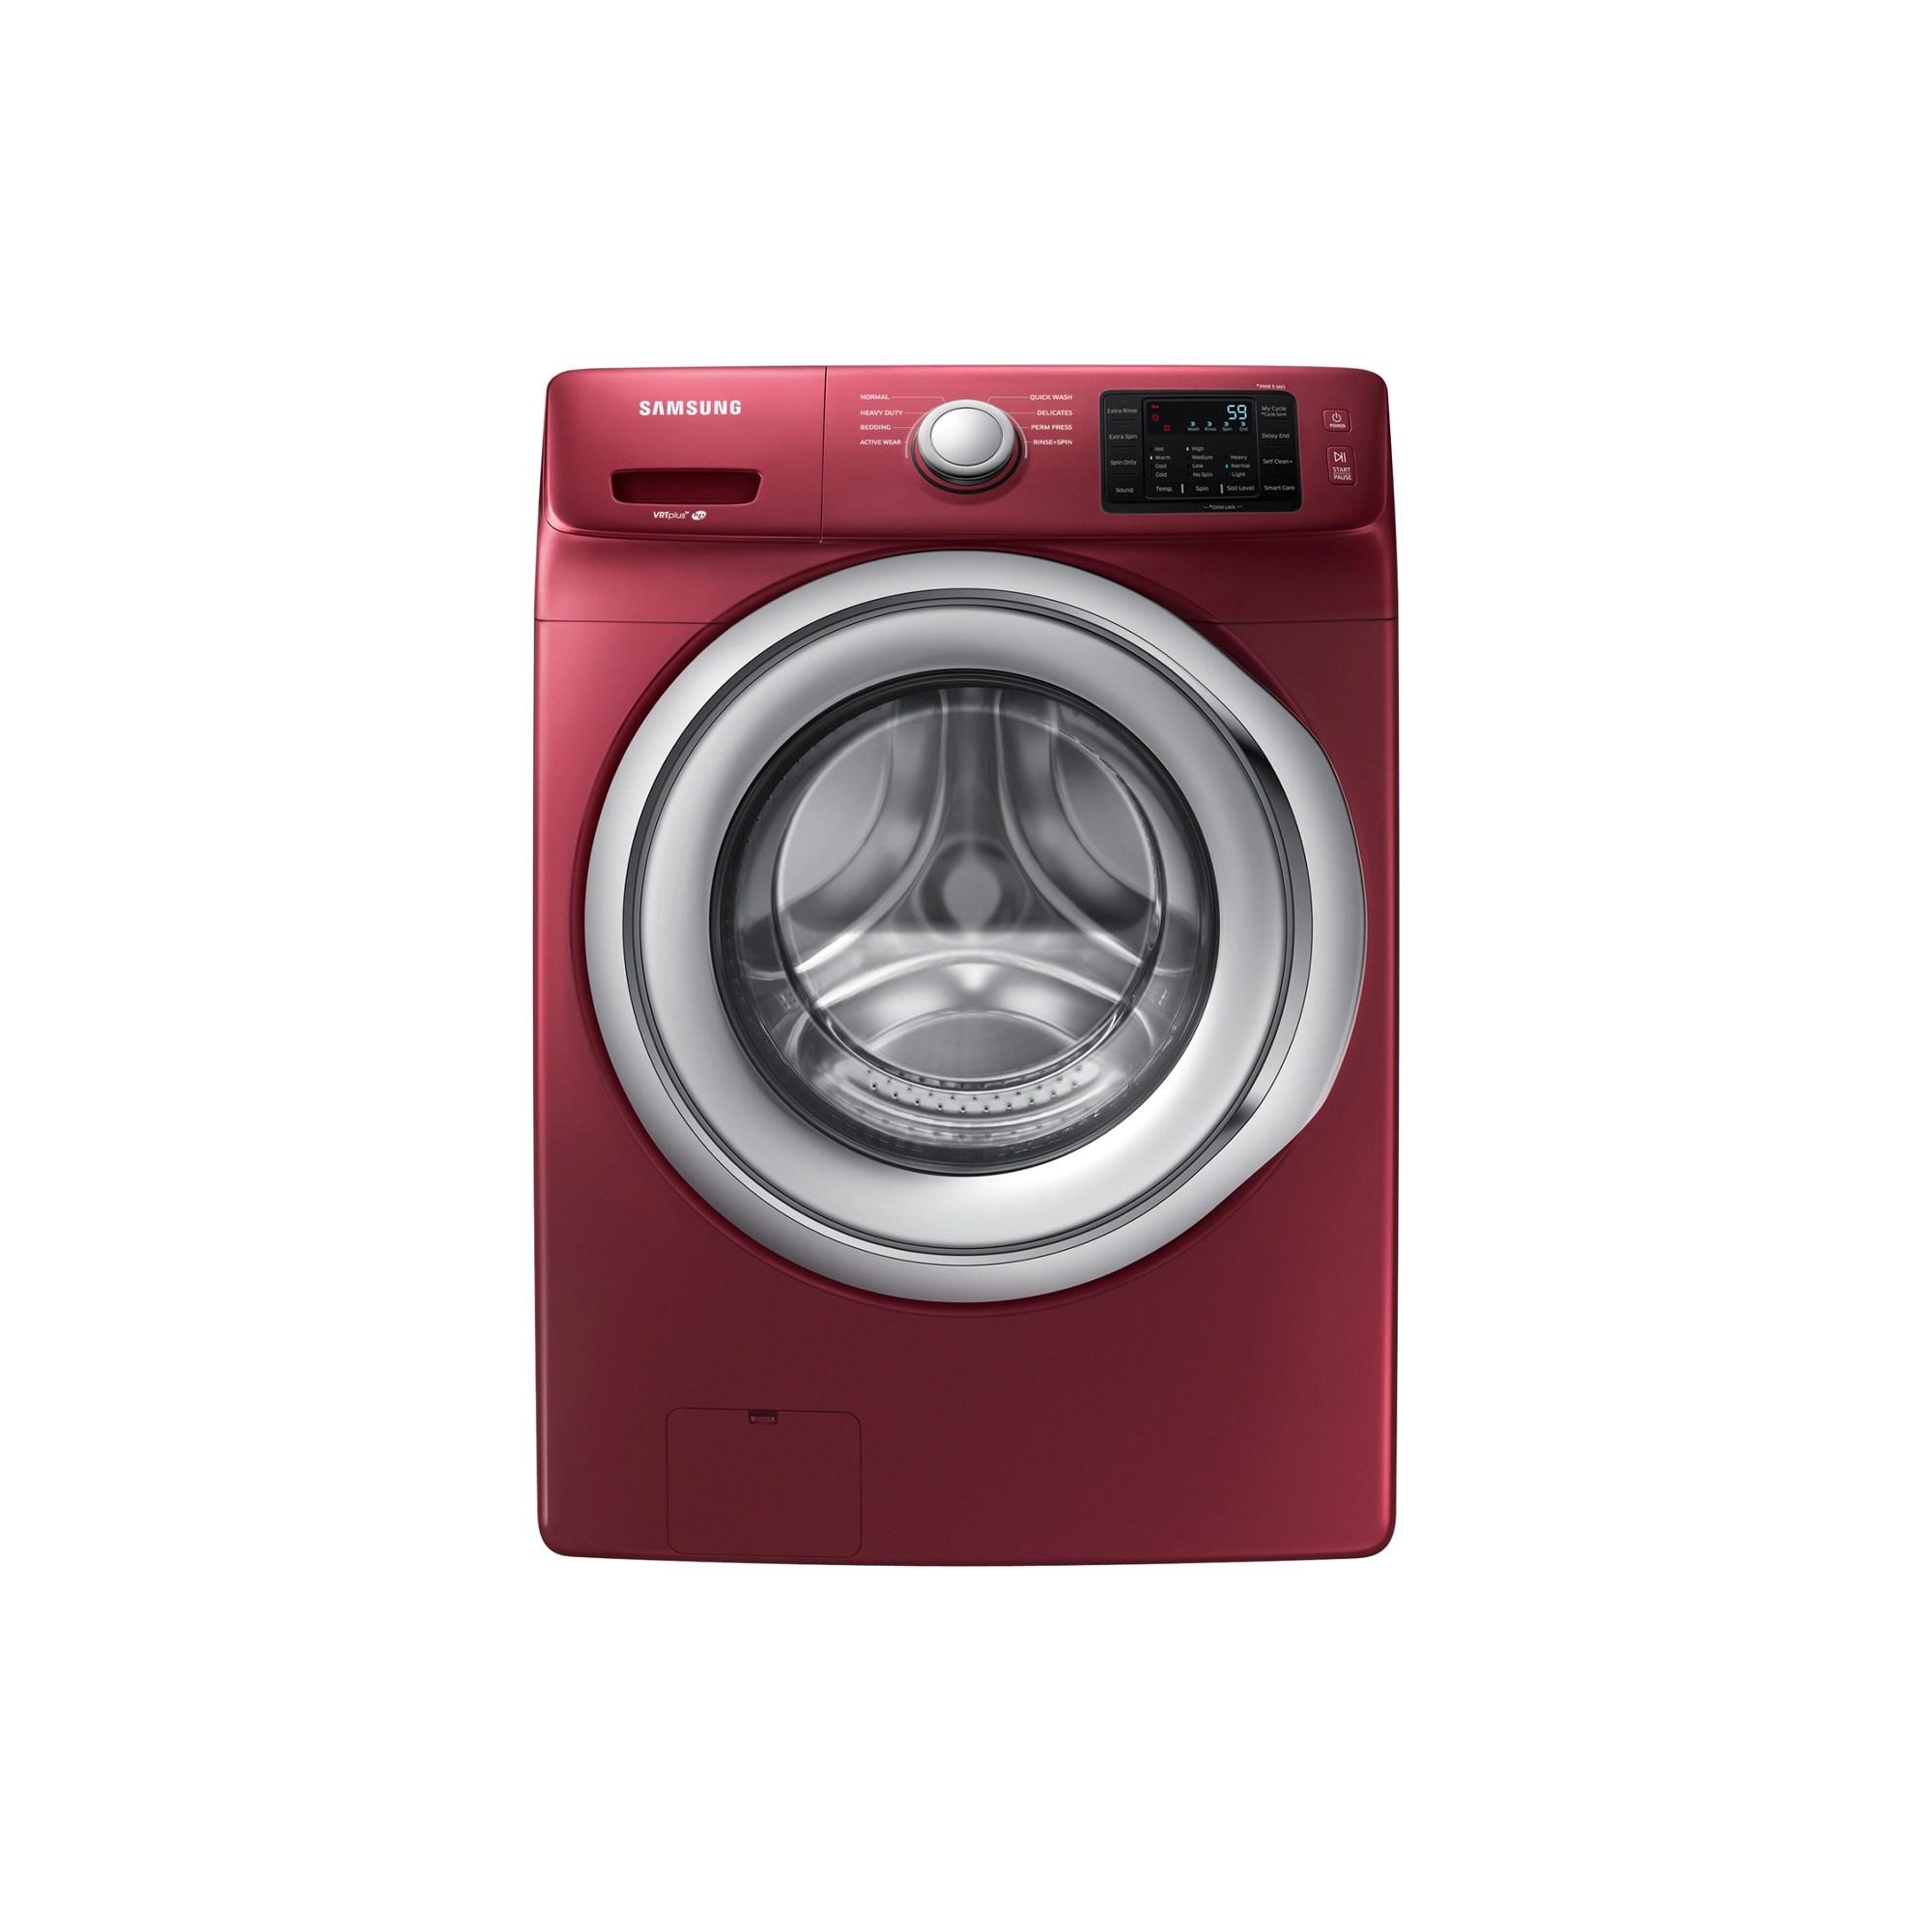 hight resolution of wf5300 4 5 cf front load washer w vrt plus 2018 washers wf45n5300af us samsung us